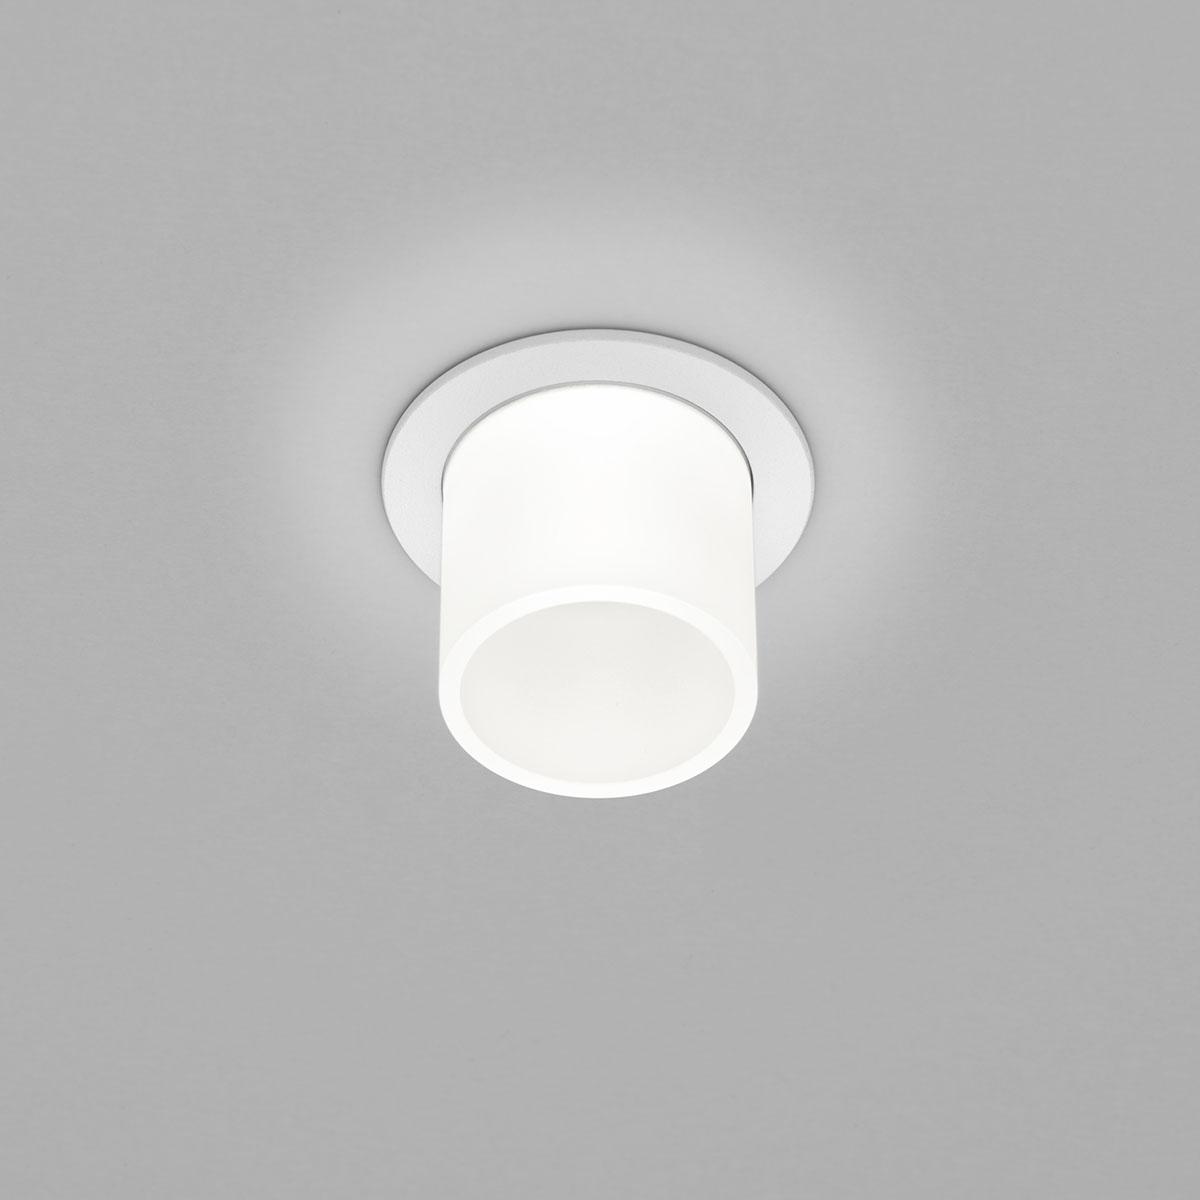 Helestra Pic LED Deckeneinbaustrahler Acryl